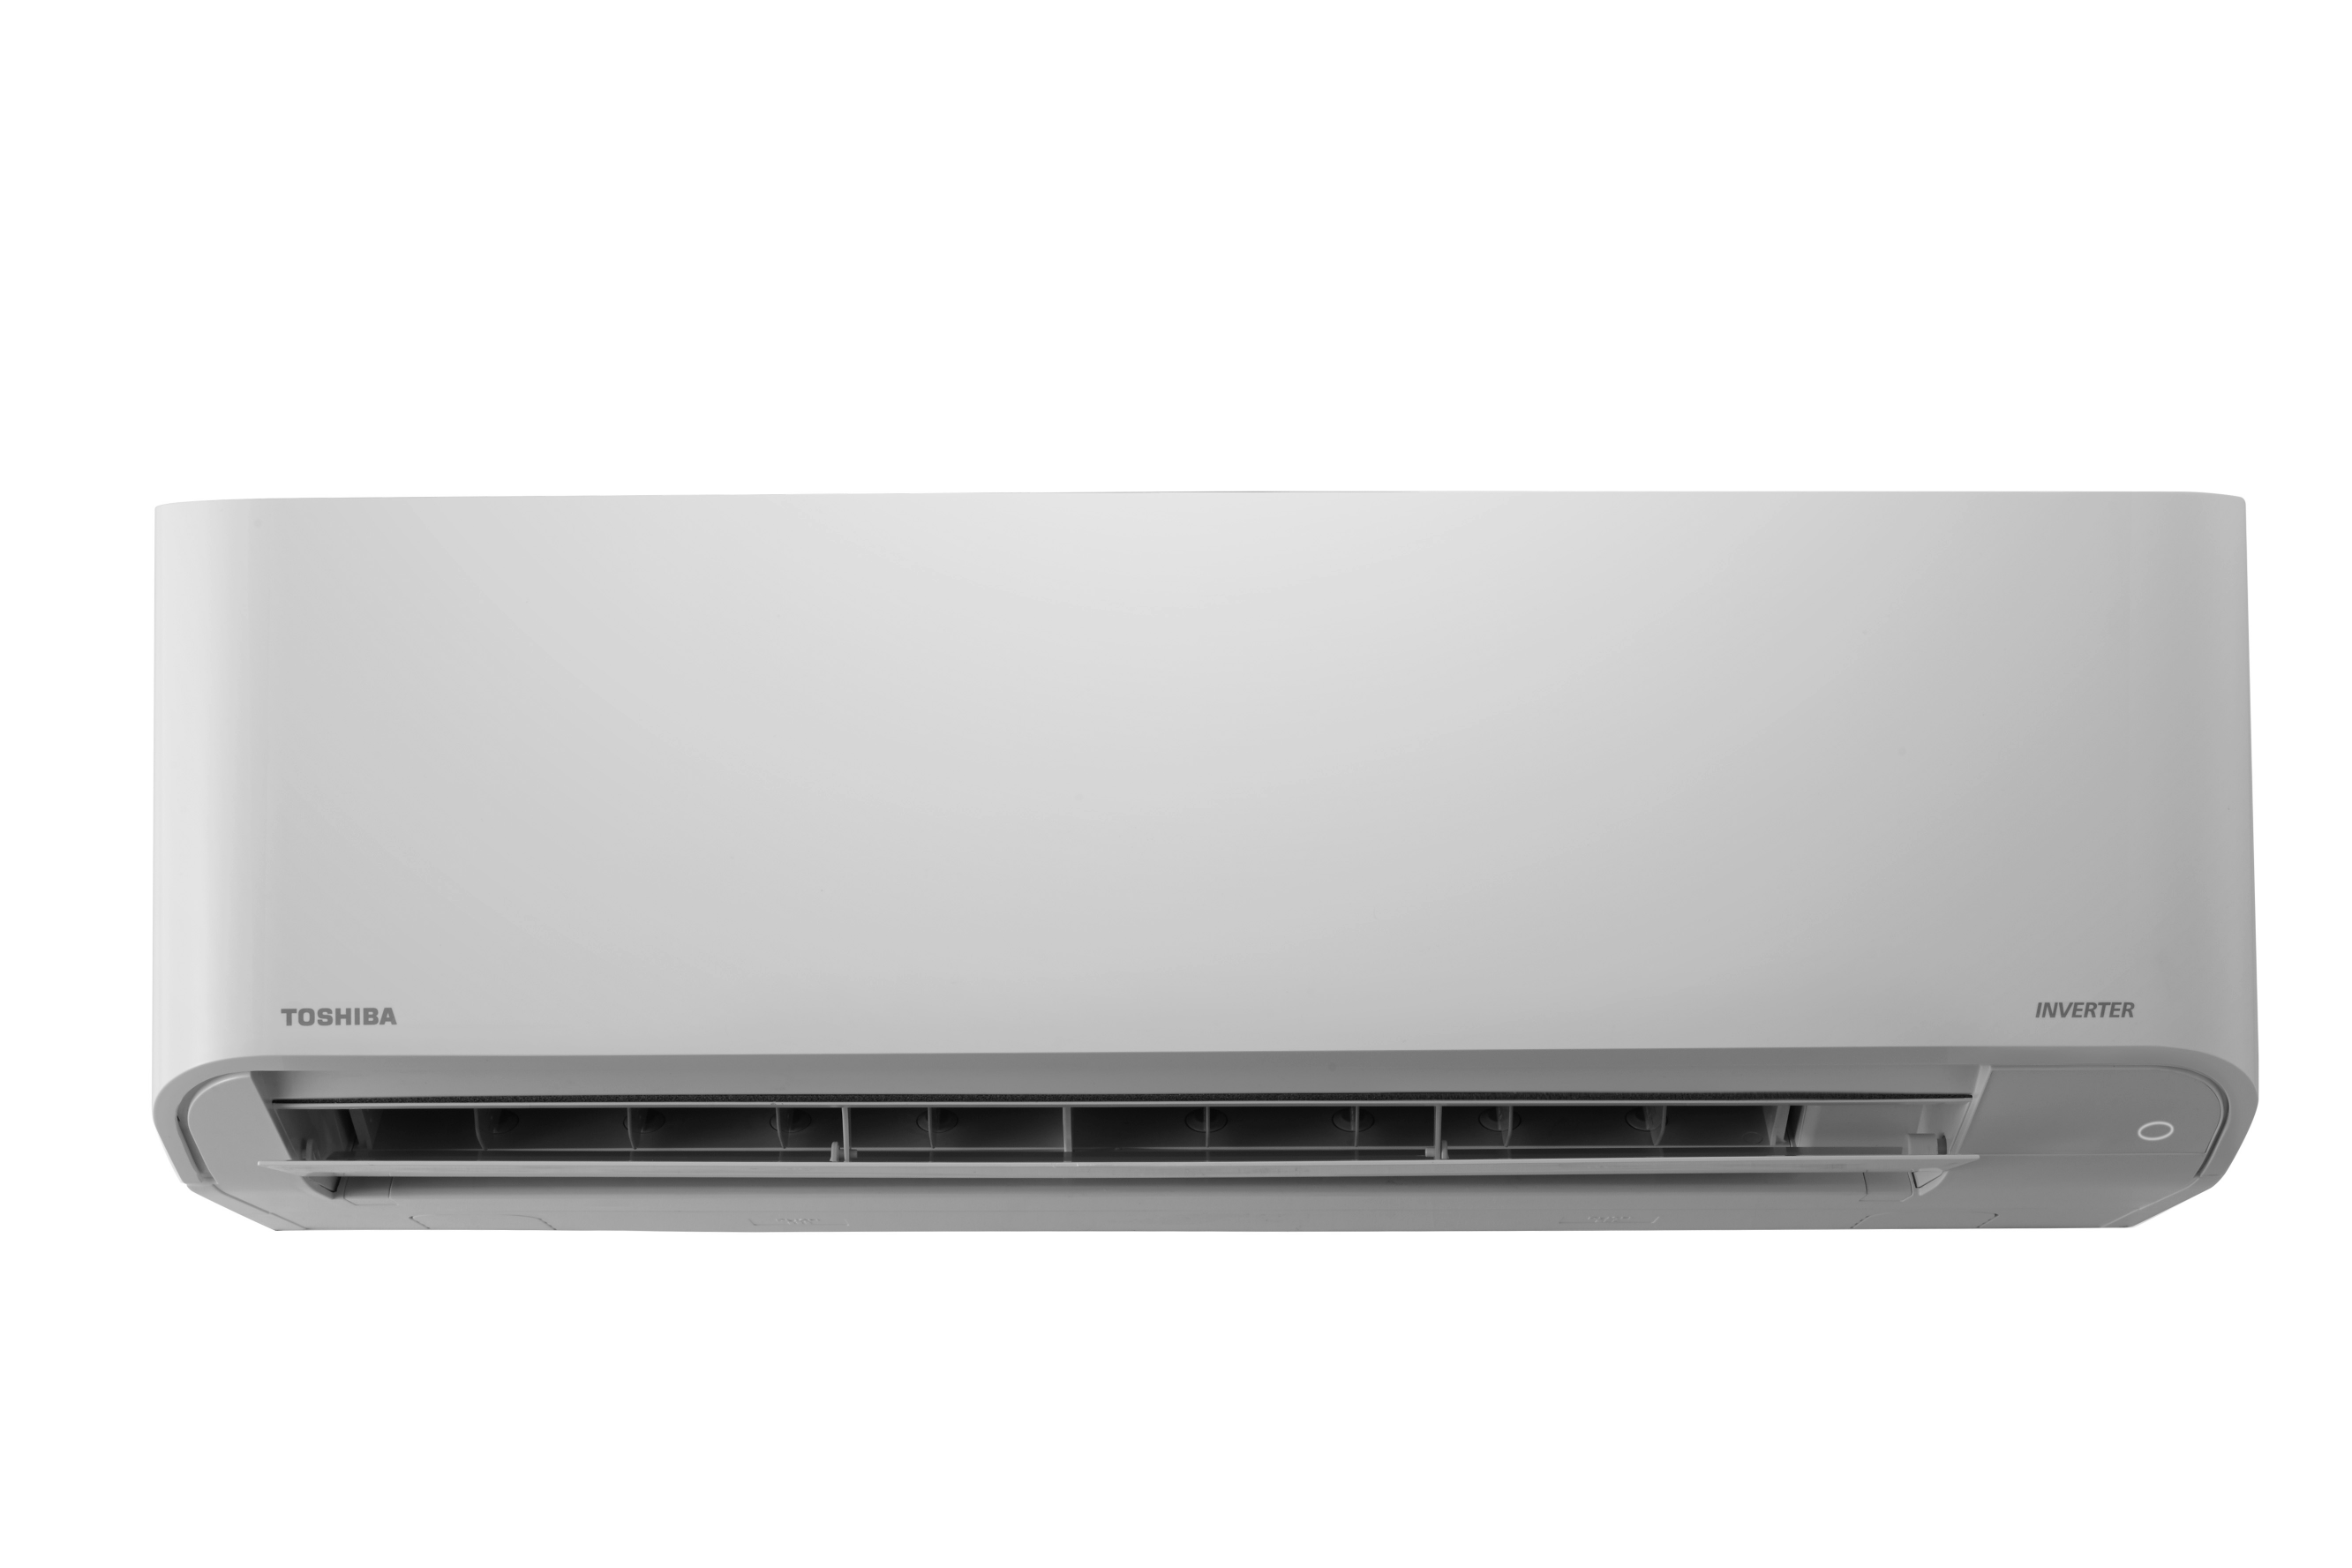 Điều hòa Toshiba 10000BTU 2 chiều inverter RAS-H10S3KV-V,RAS-H10S3KV-V,Toshiba inverter 10000 BTU 1 chiều